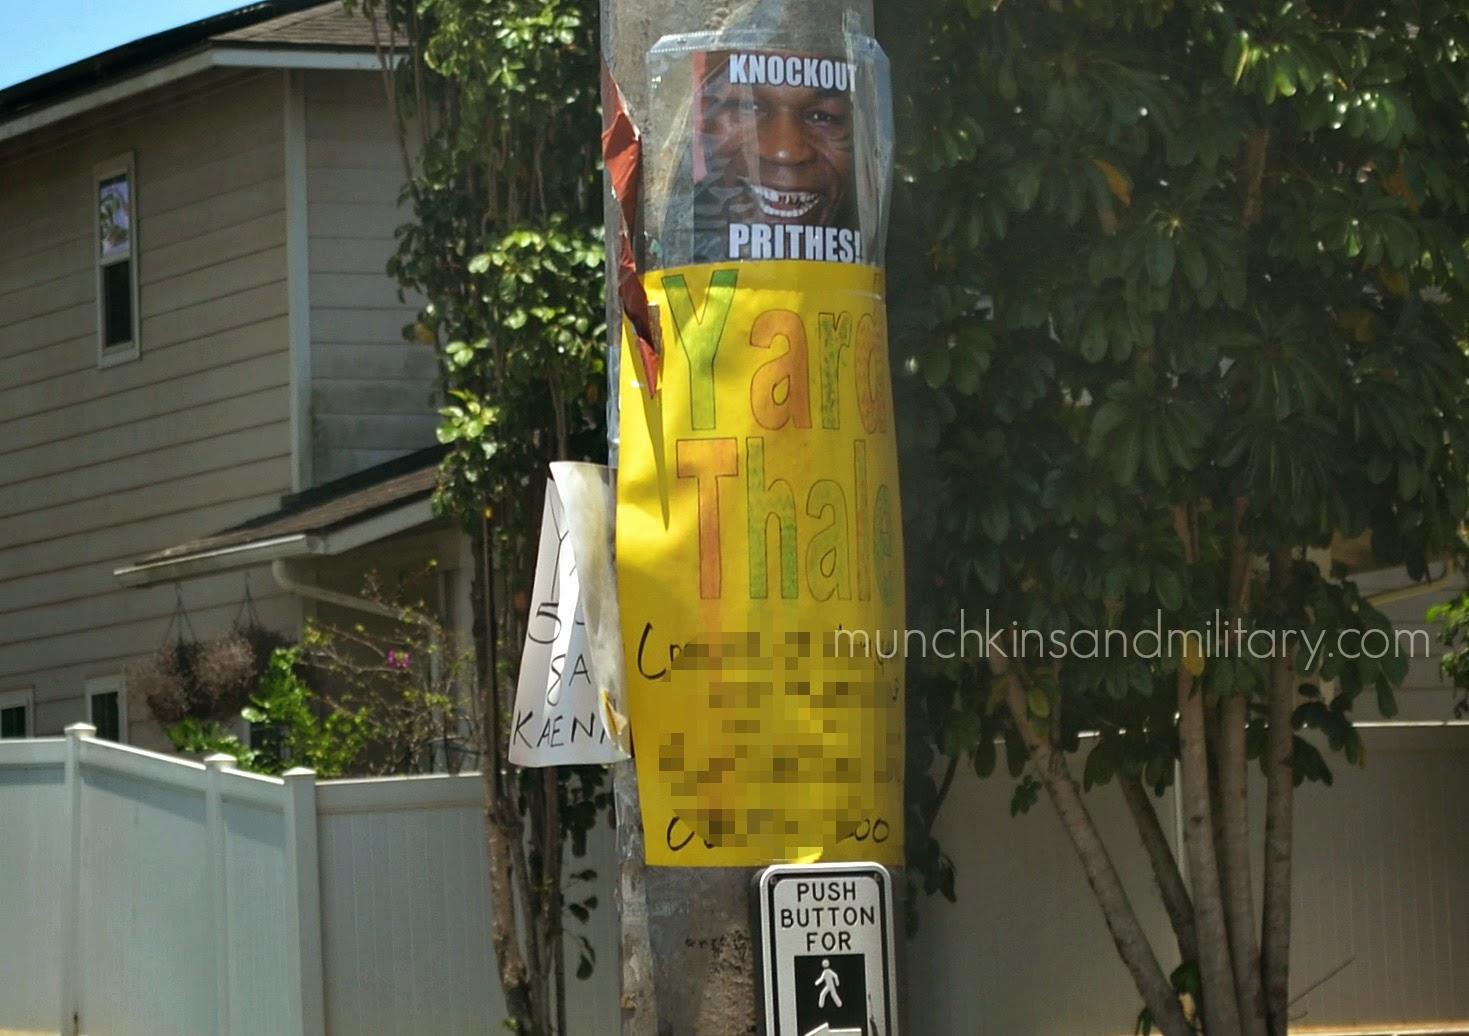 mike tyson yard sale sign